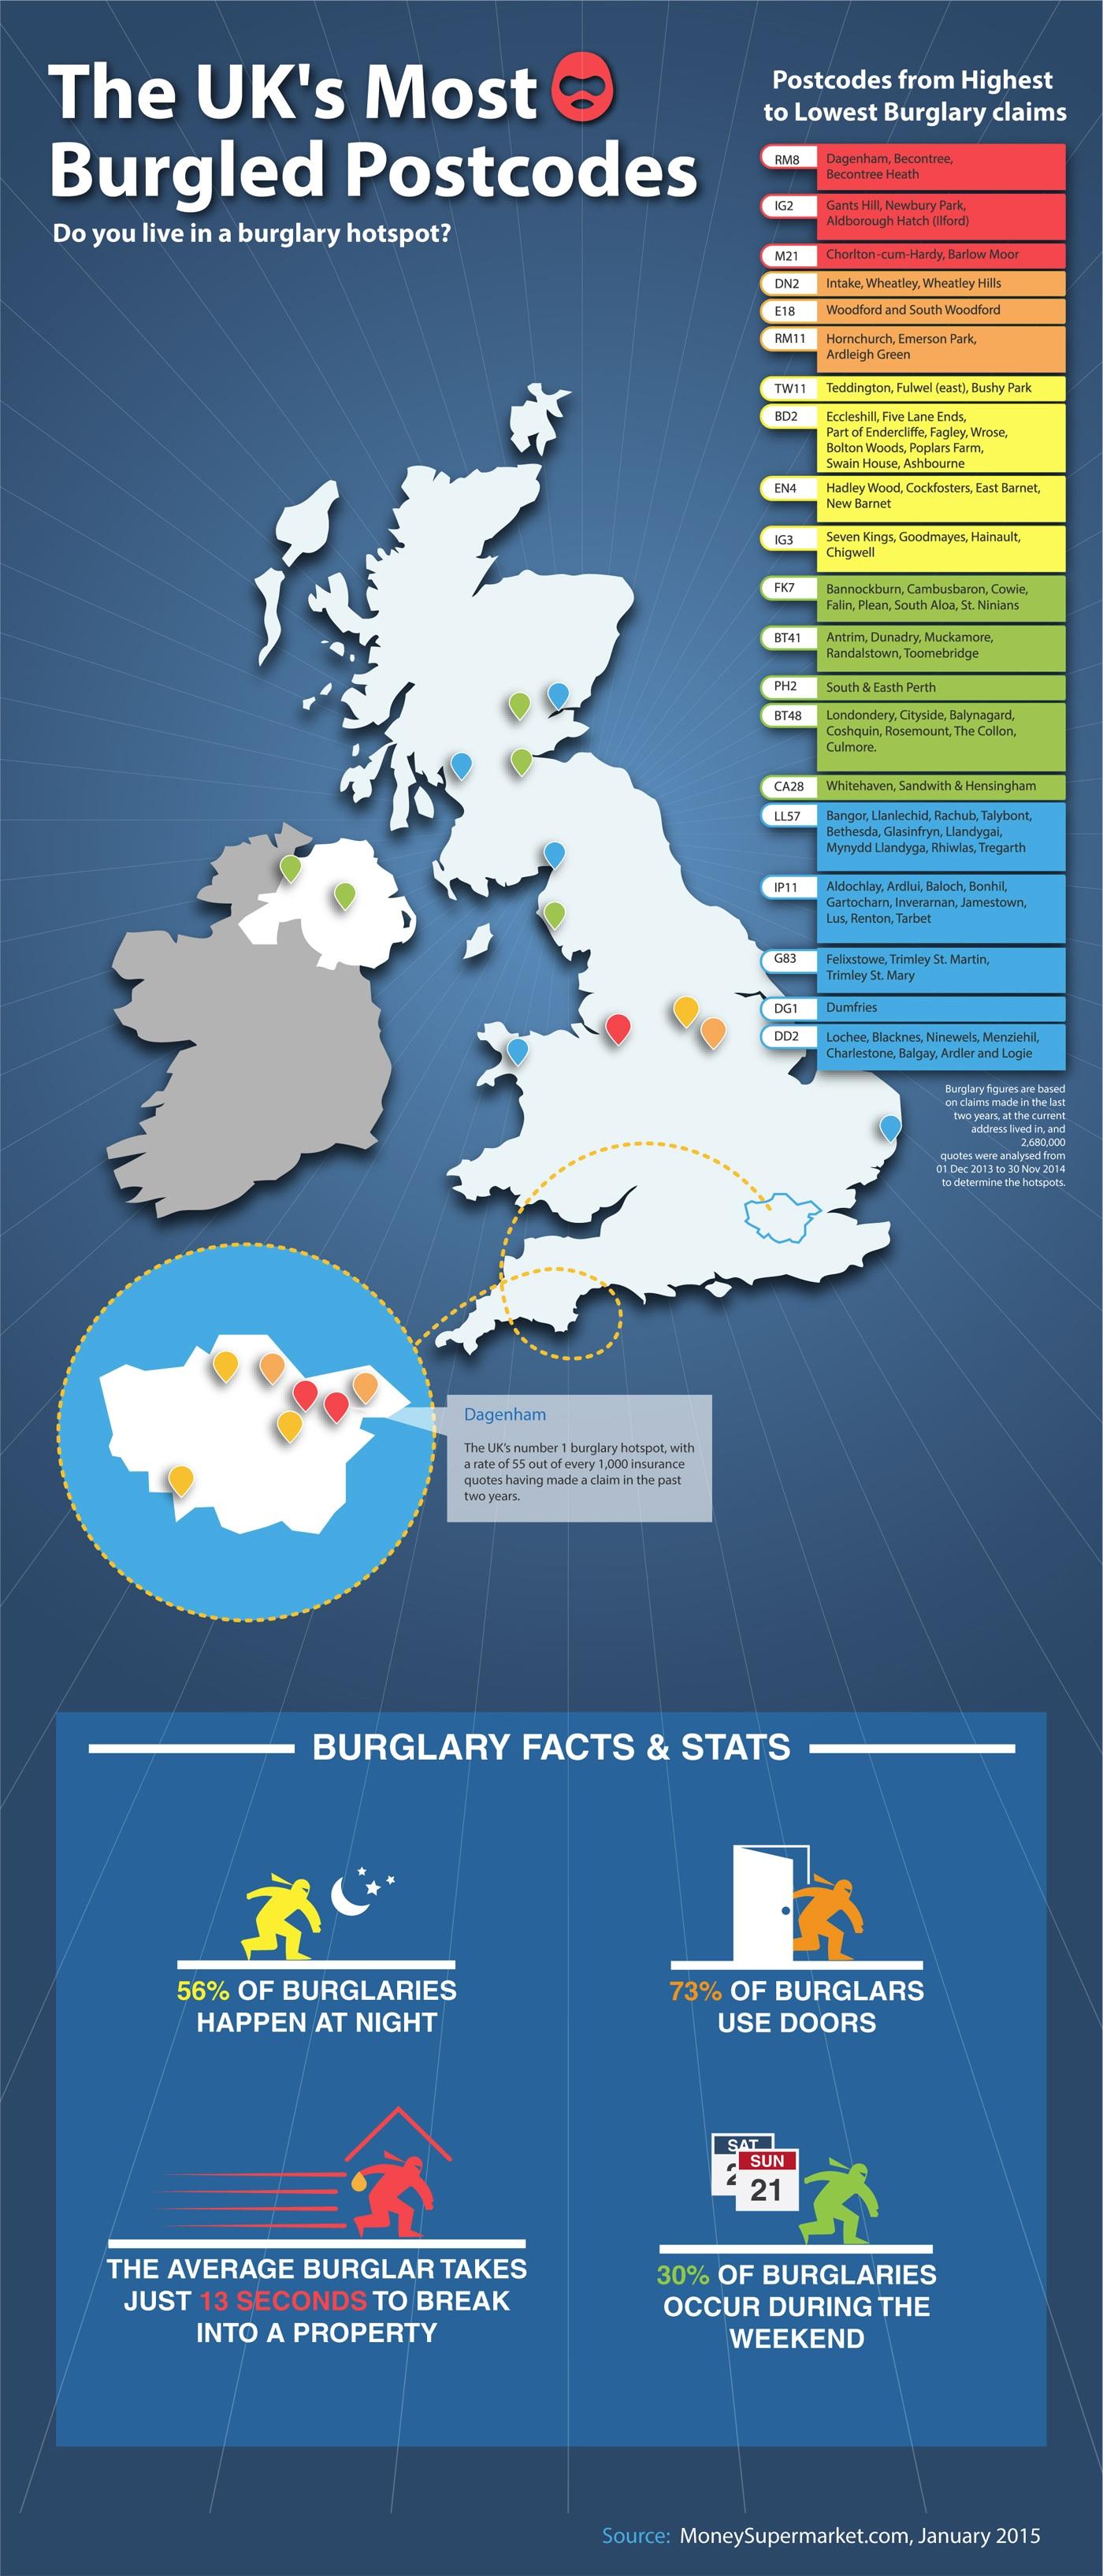 Burglary rates rise in the UK